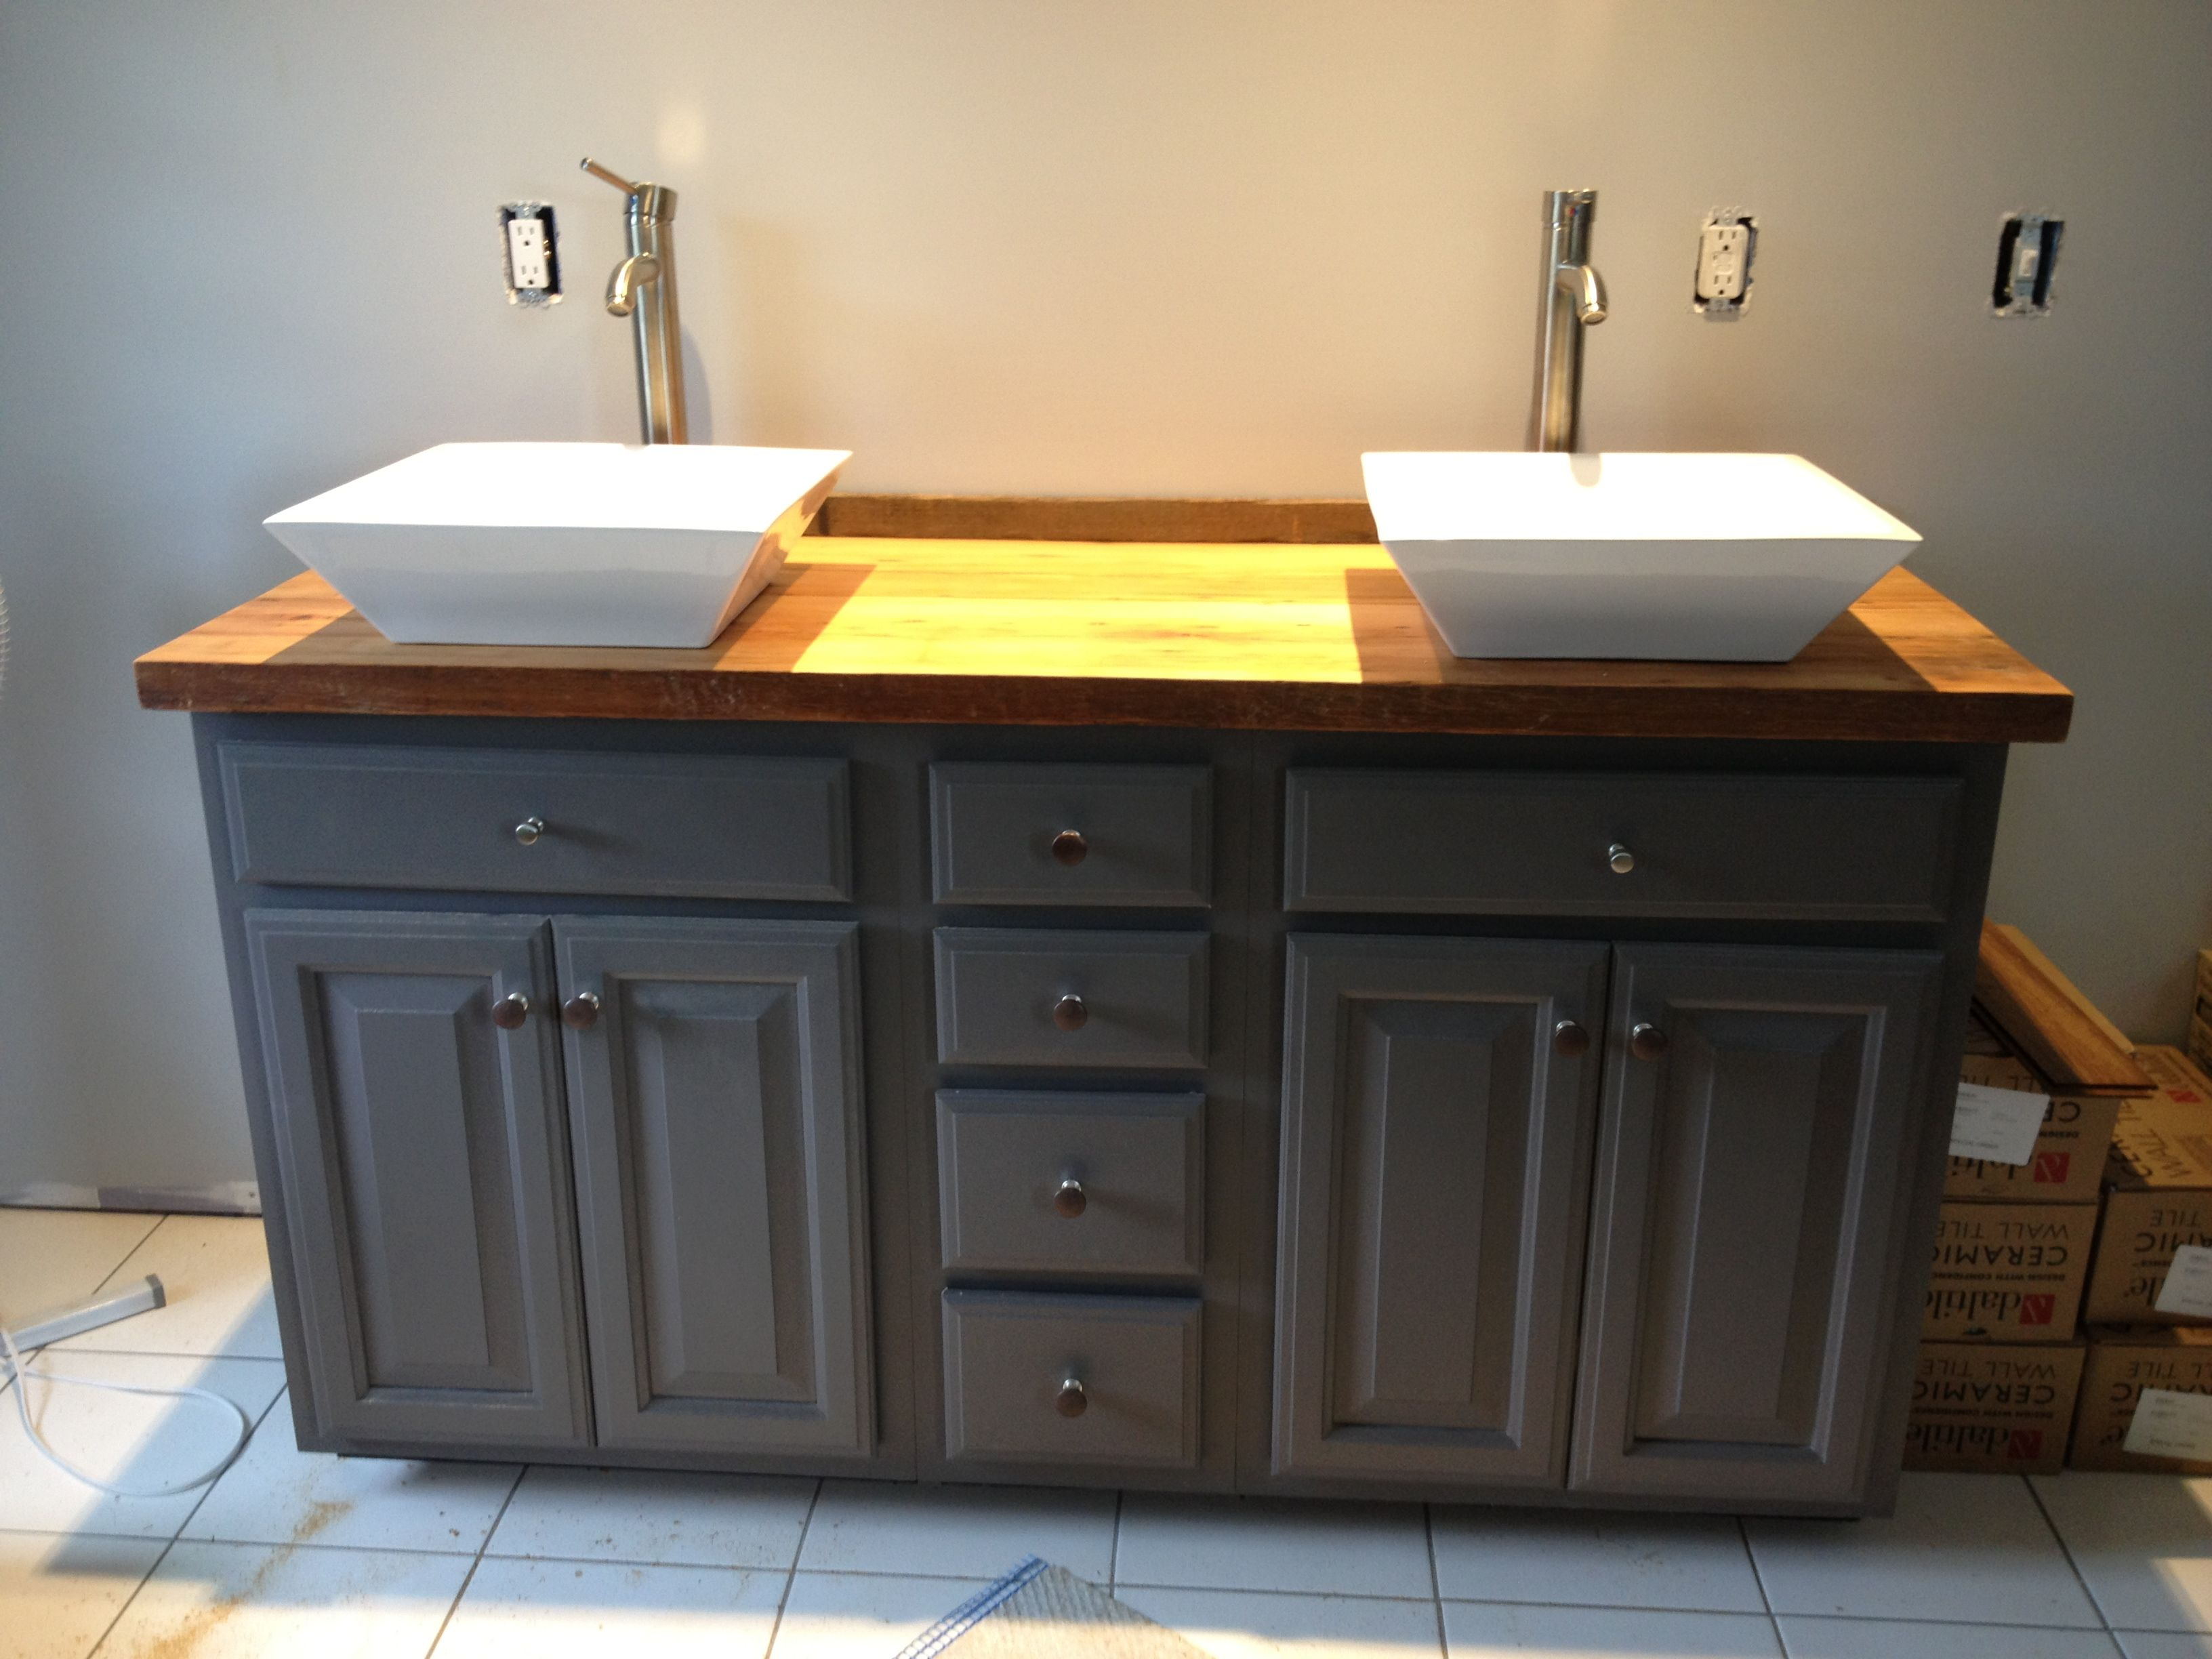 Diy Bathroom Vanity Used The Barn Wood Hemlock Pieces Finished